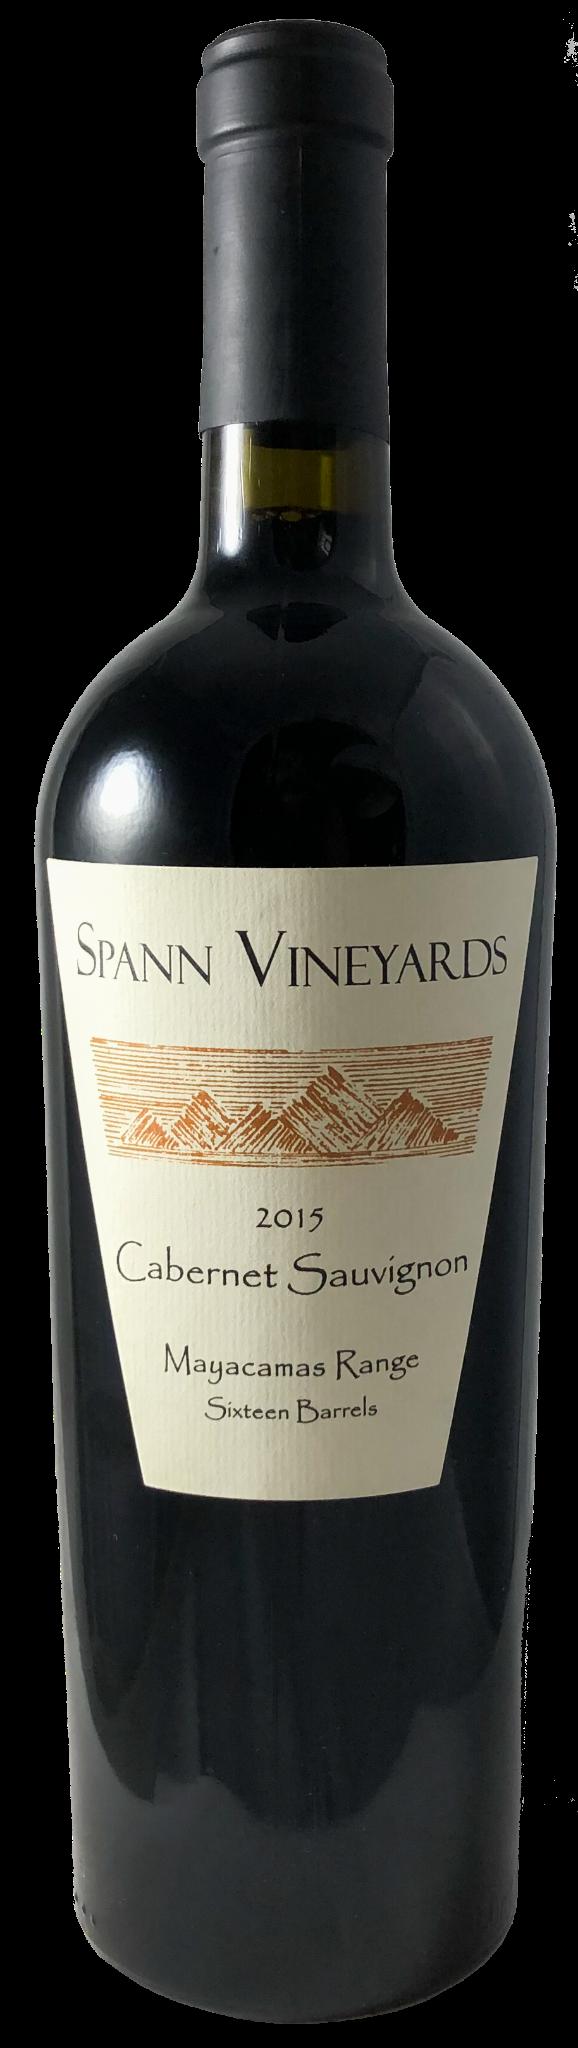 spann-vineyards-2015-cabernet-sauvignon-1-1-1